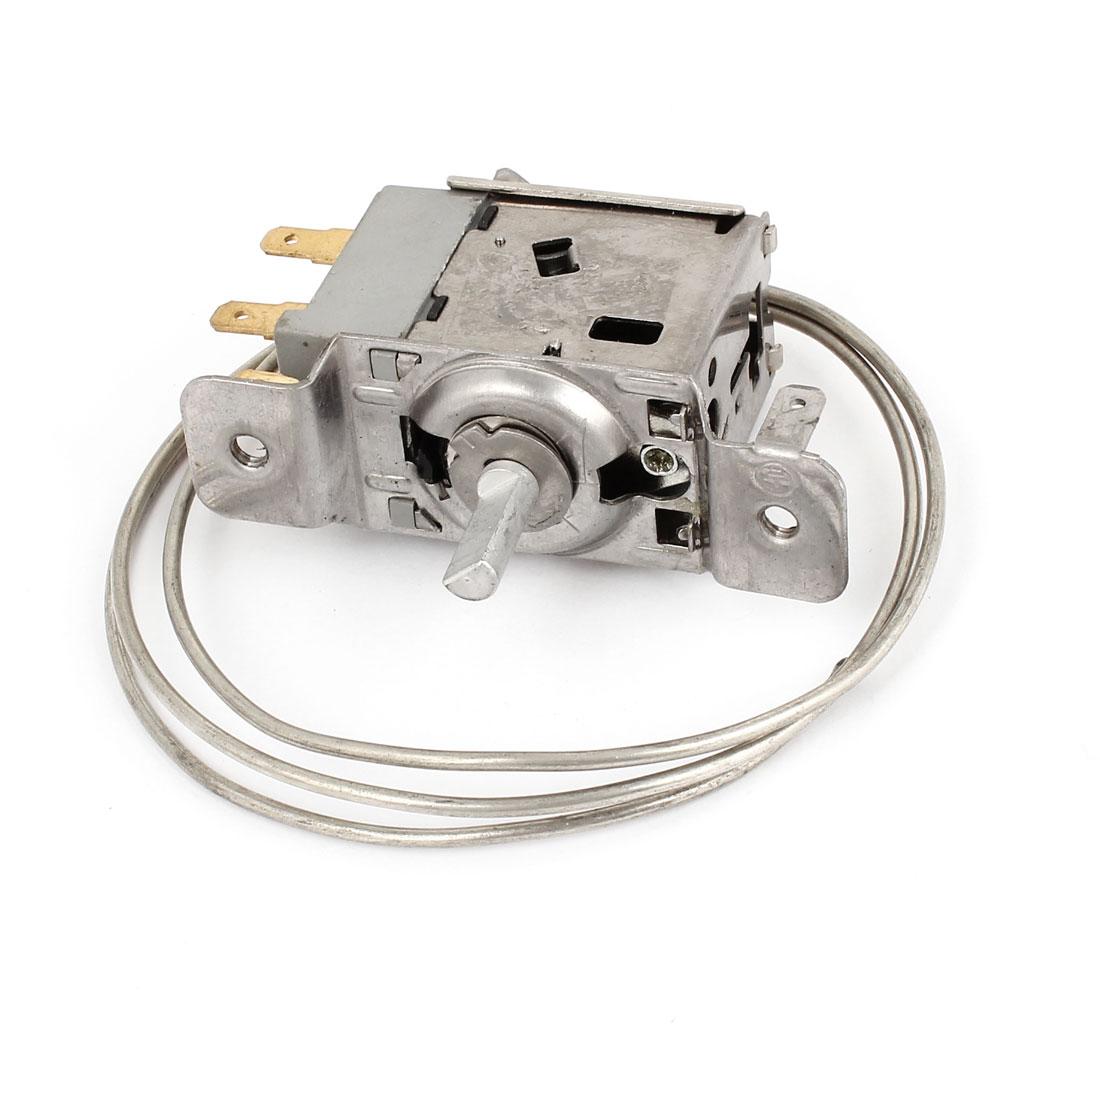 AC 220V-250V 5A 3 Pin Temperature Controller Thermostat WDF18 for Refrigerator